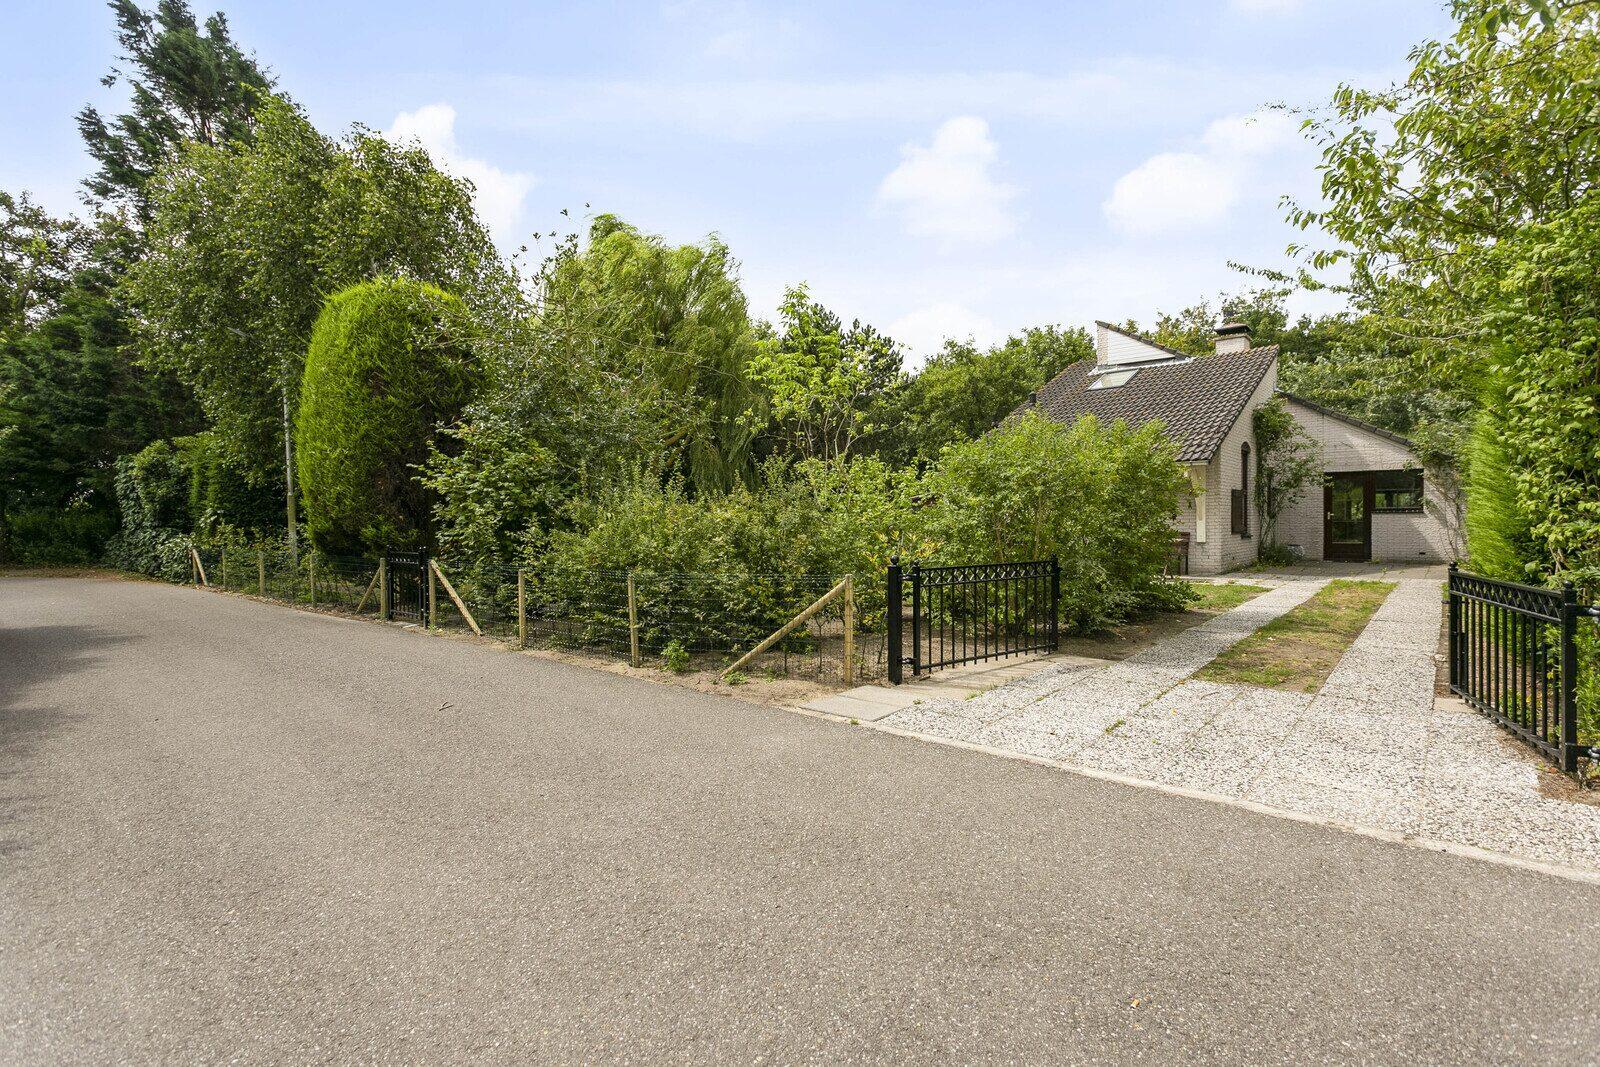 Doggersbank 39 - Noordzeepark Ouddorp